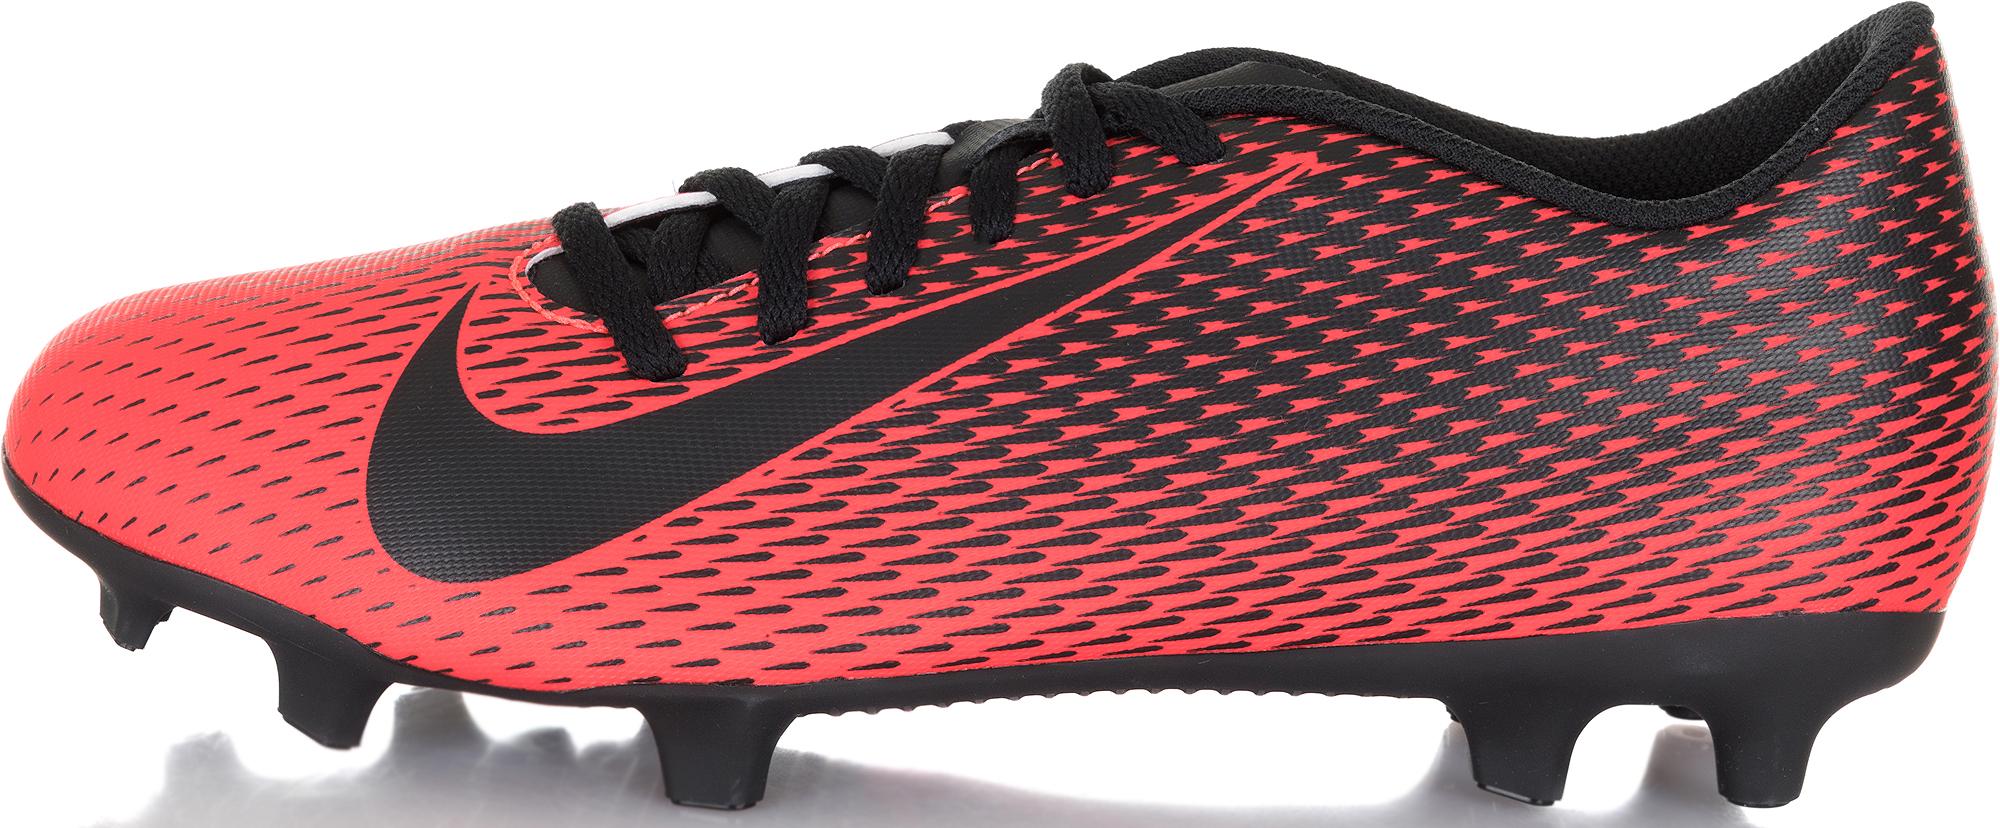 Nike Бутсы мужские Nike Bravata II FG, размер 45